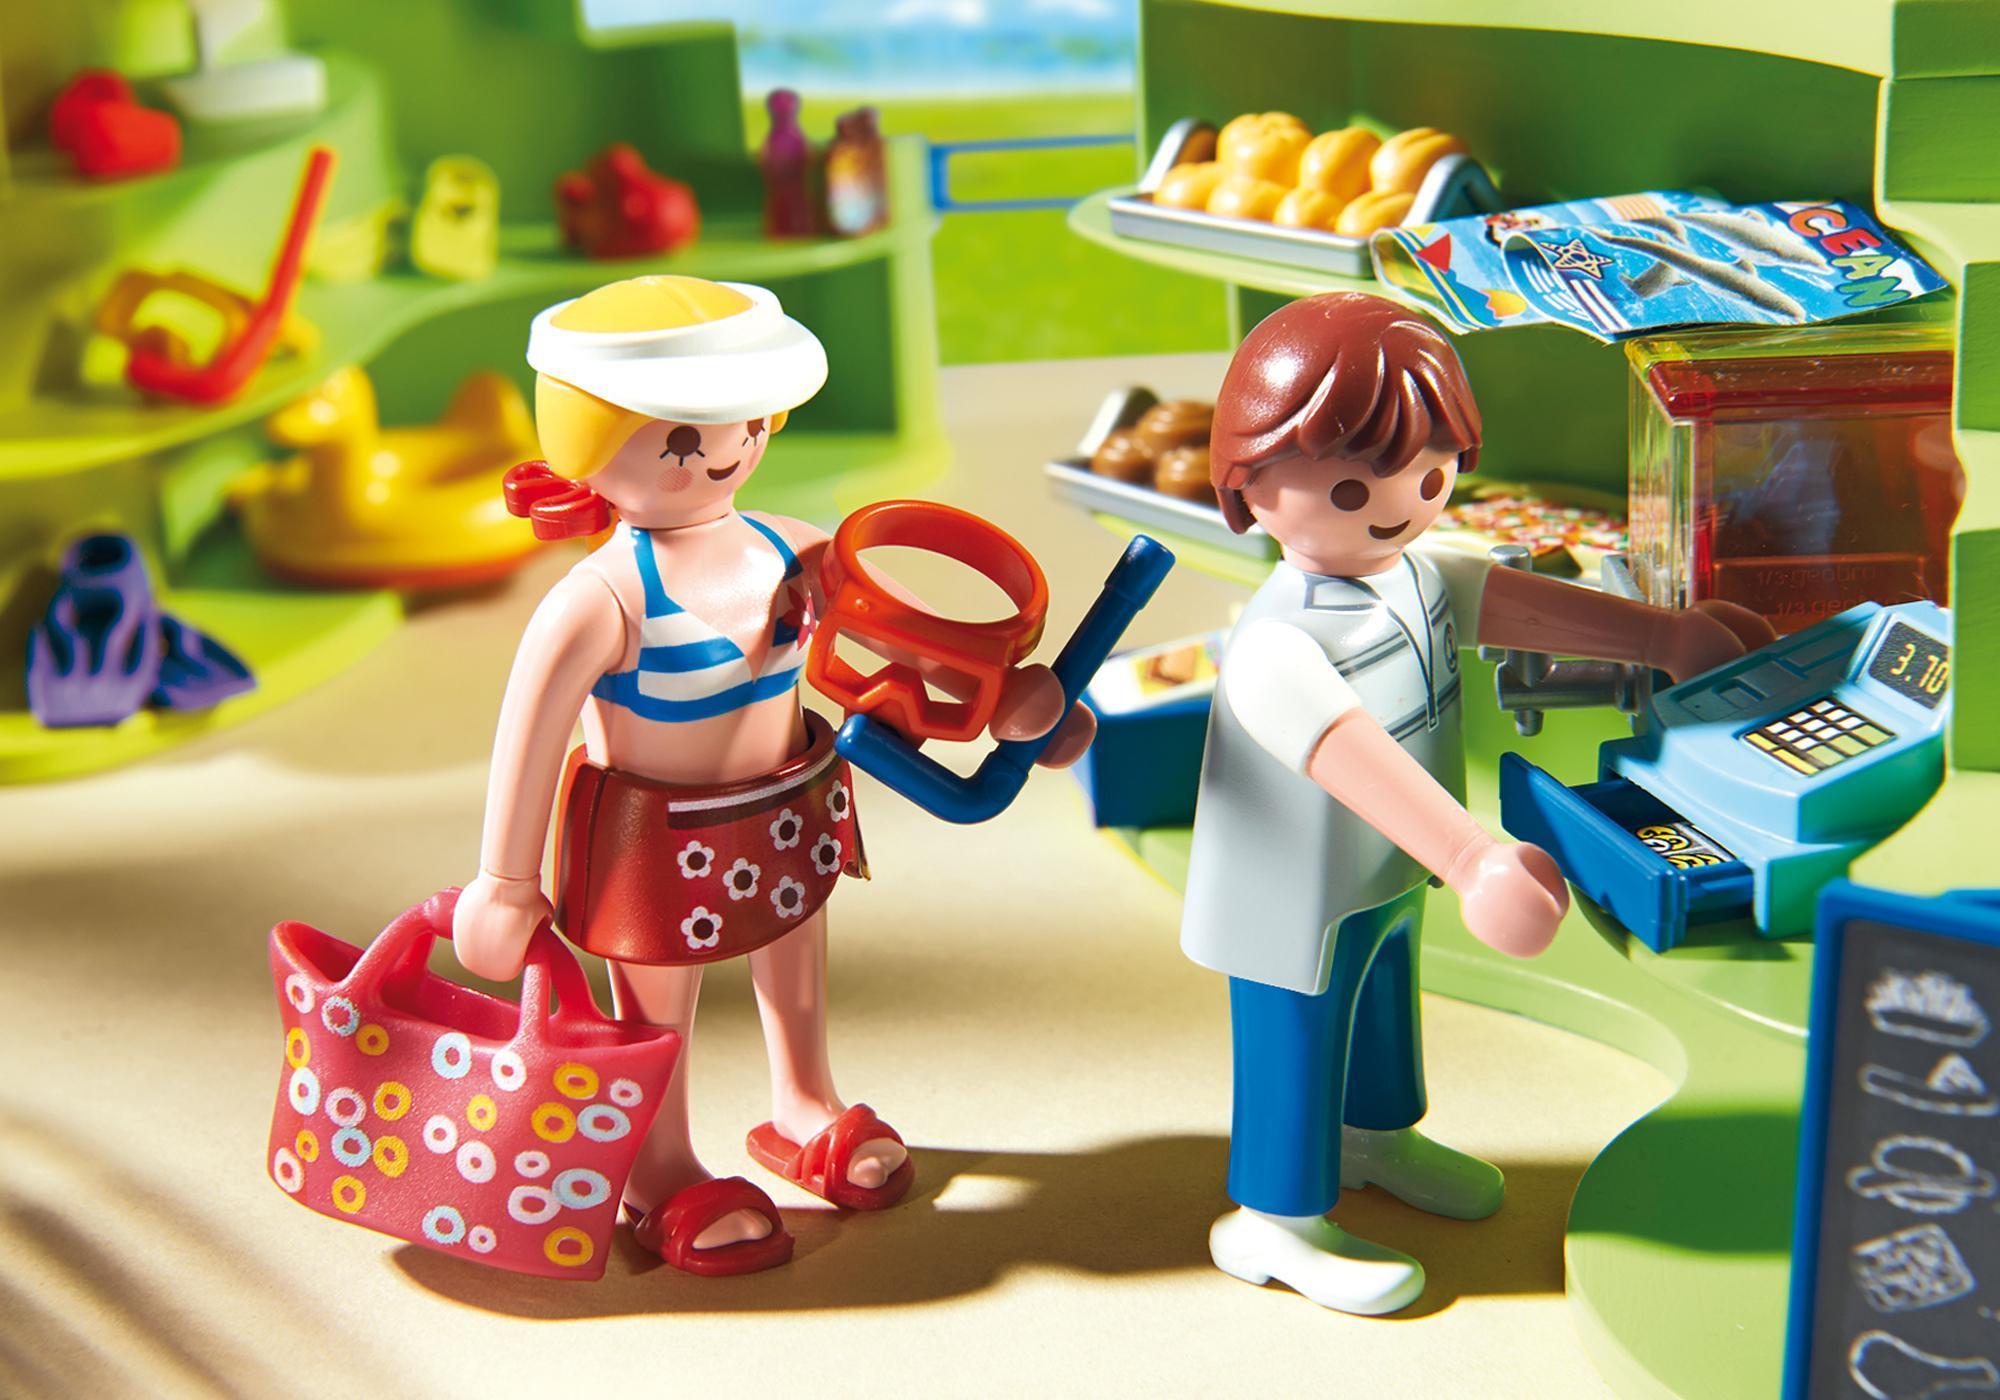 http://media.playmobil.com/i/playmobil/6672_product_extra1/Ristorante fast food